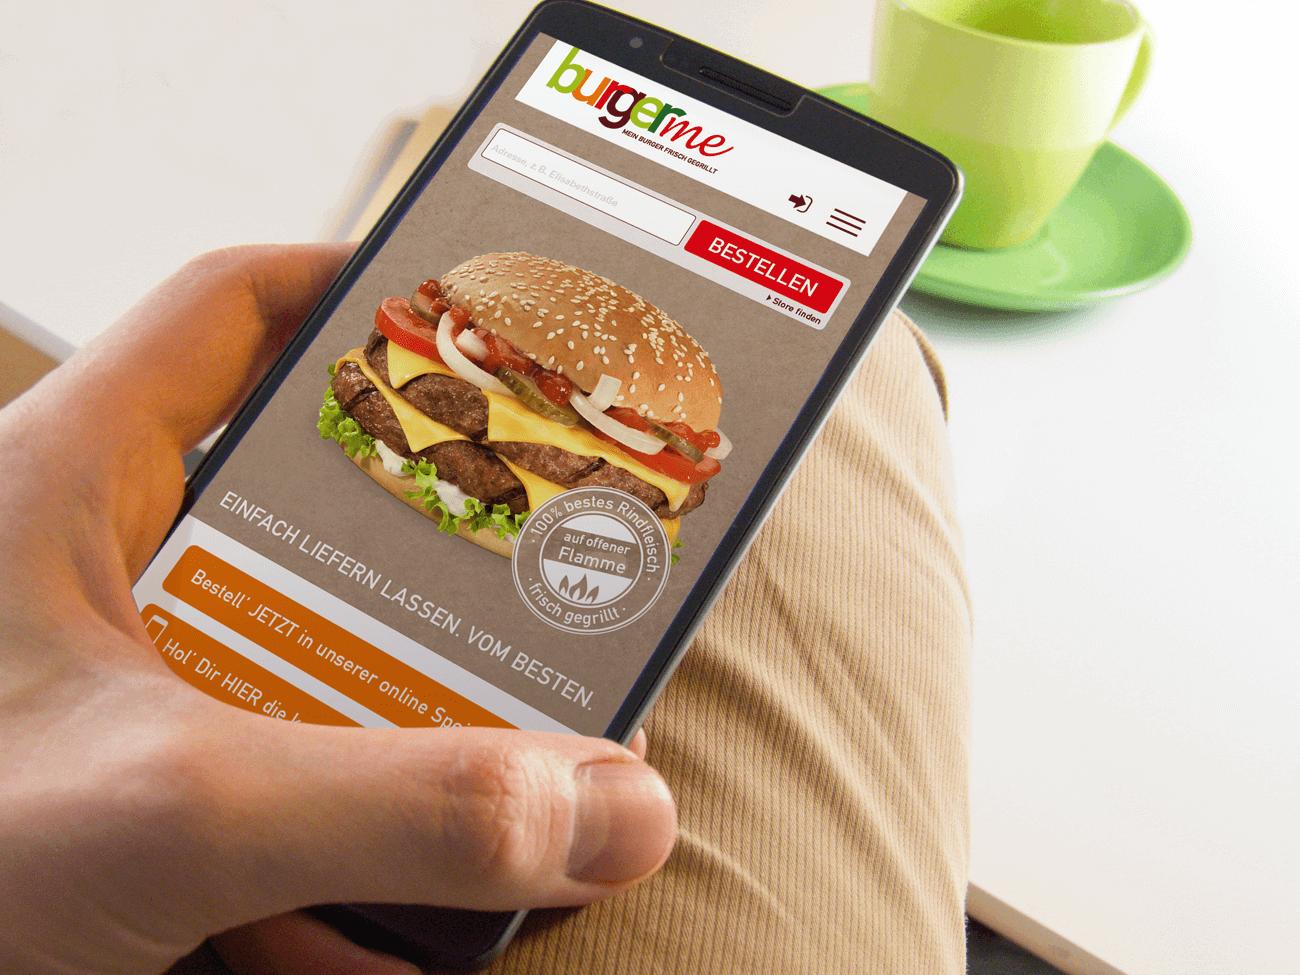 Burgerme mobil mit App bestellen